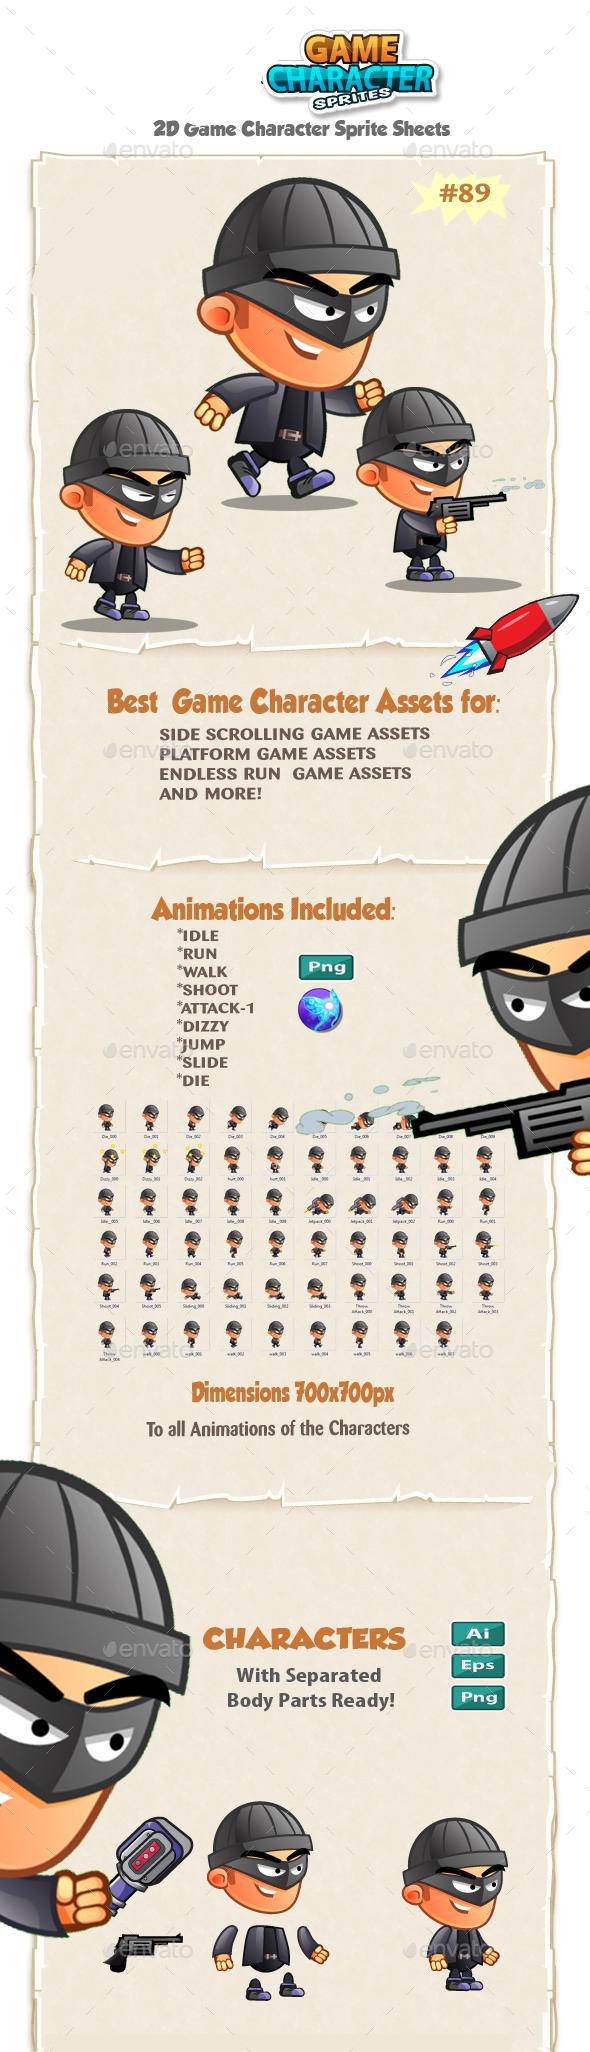 Bad Guy 2D game Character Sprites 89 - Sprites Game Assets